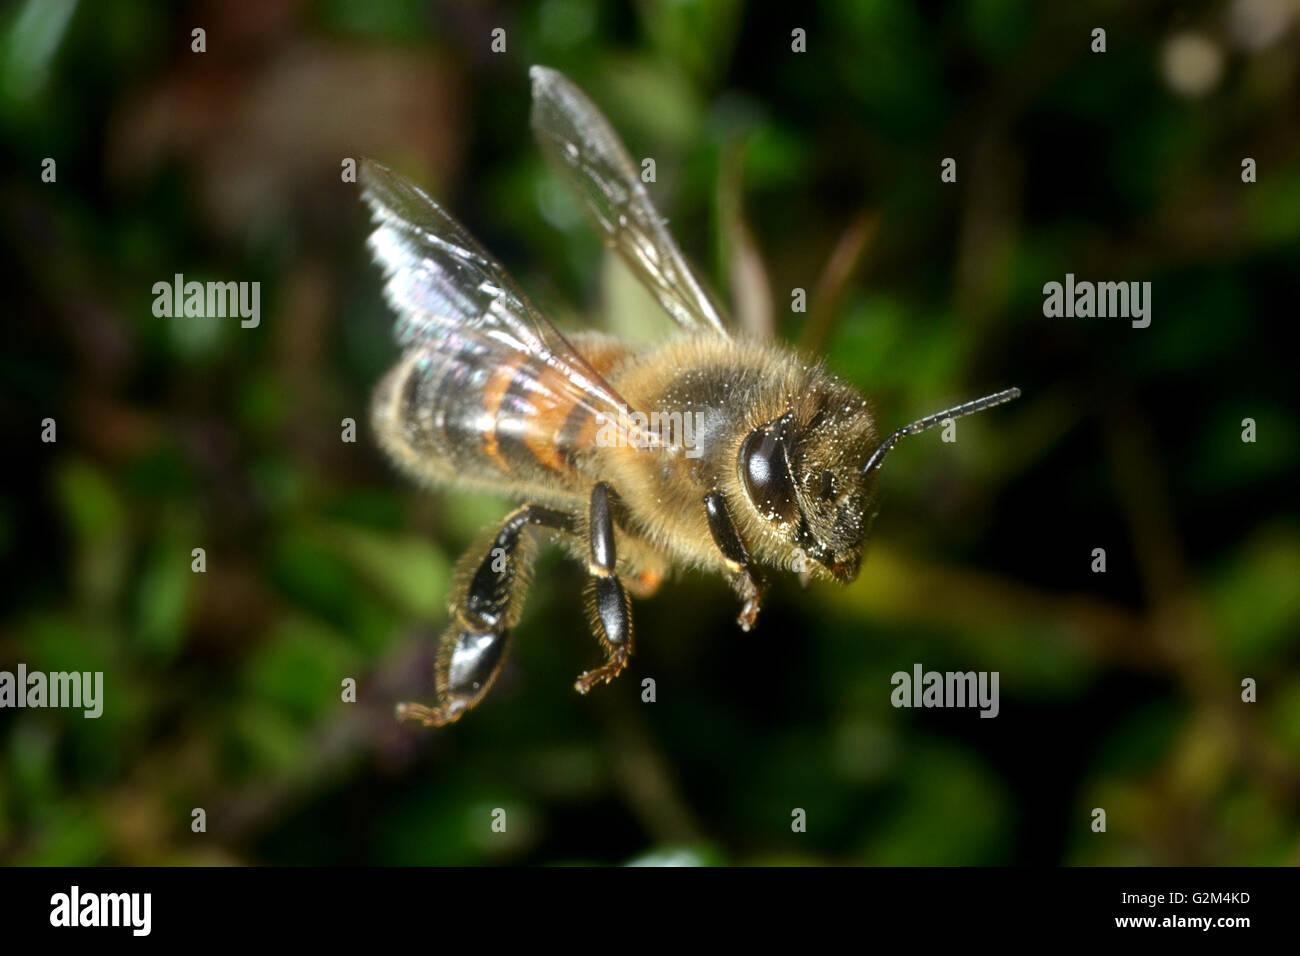 wilde Bienen im Flug Stockbild